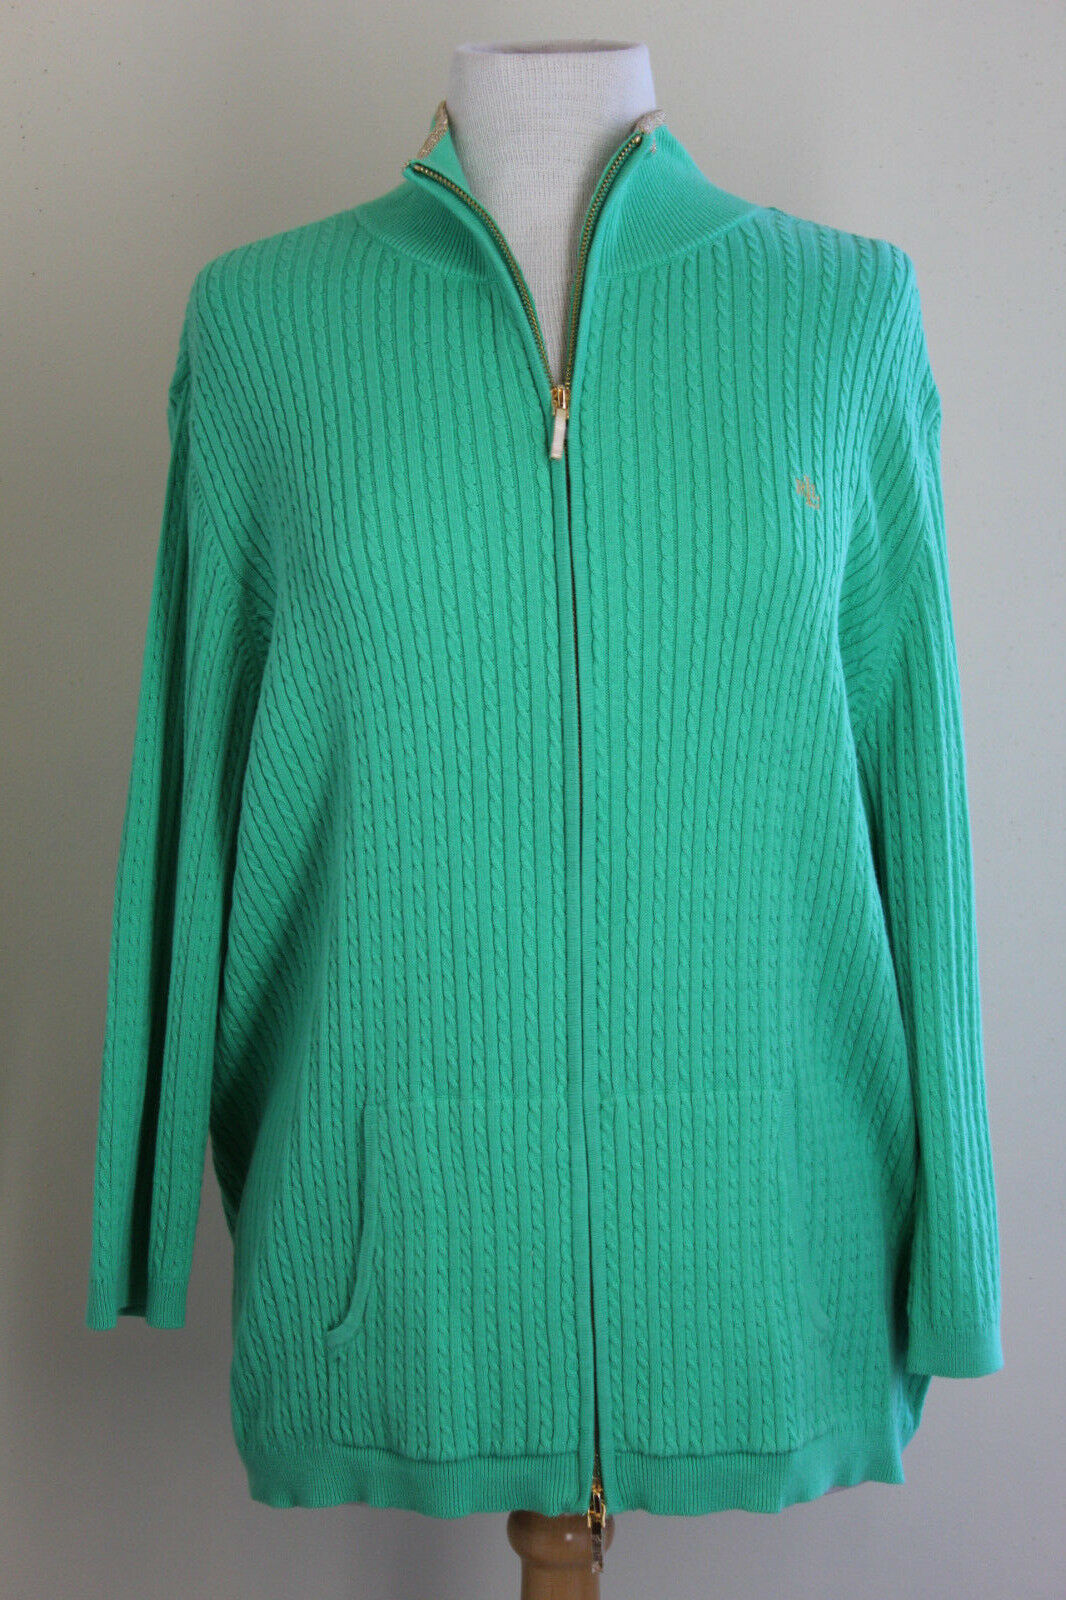 NWT Ralph Lauren -Sz 2X - Green Cable Logo Zip-Up Cardigan Sweater